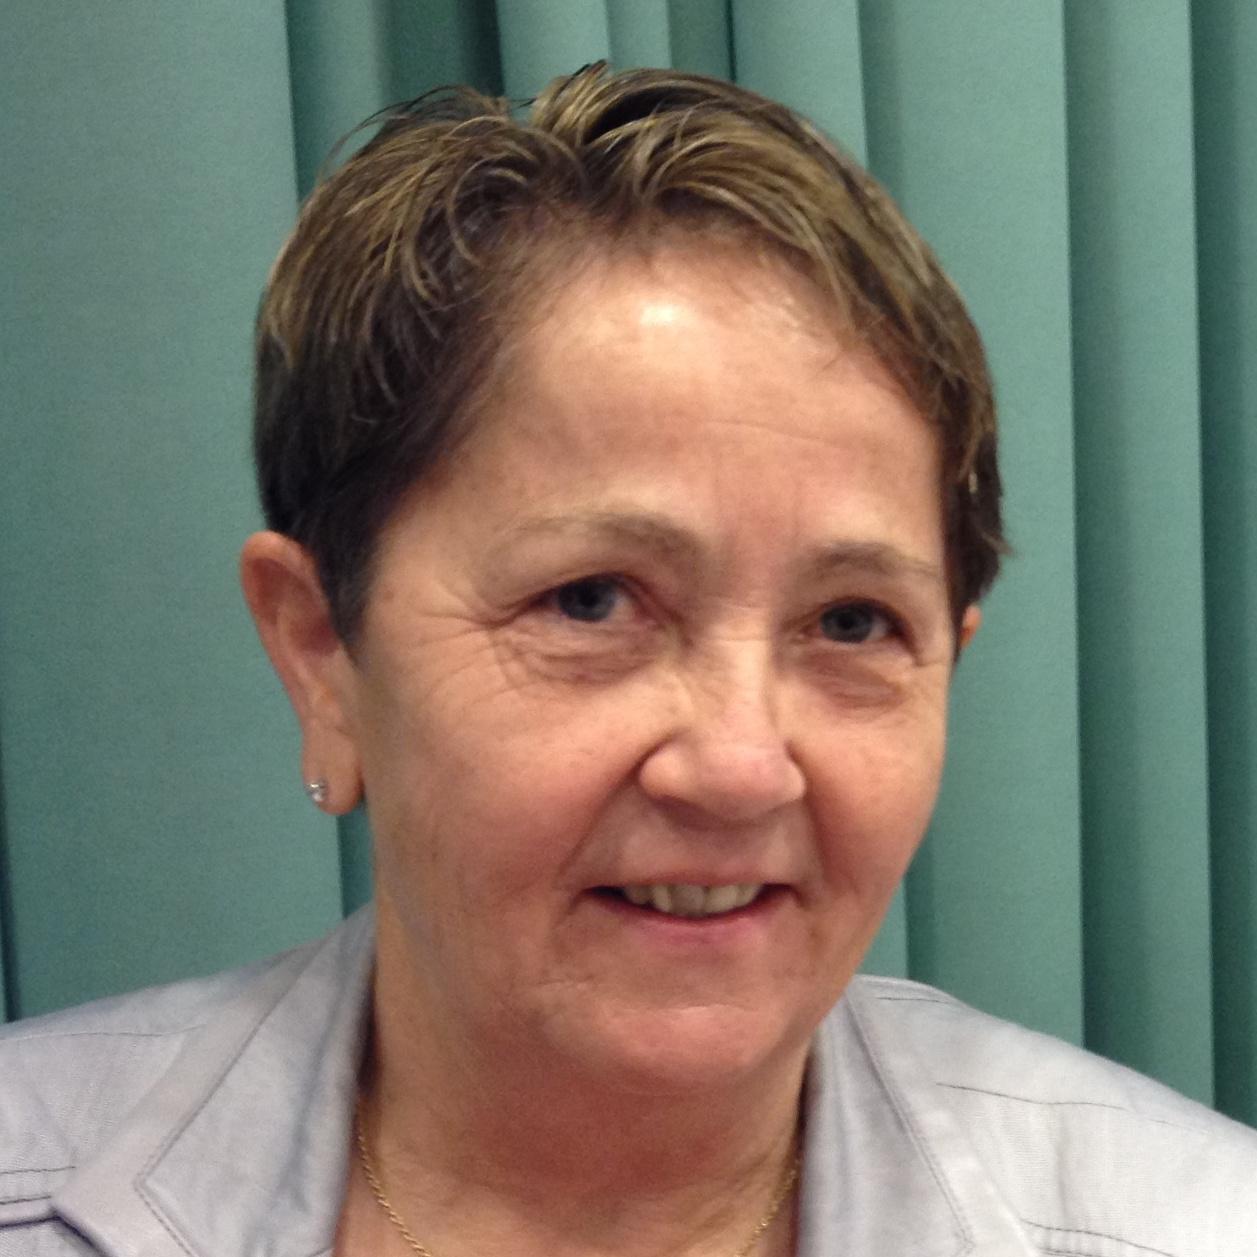 Hildegard Fässler, Ex Consigliera nazionale ed economista